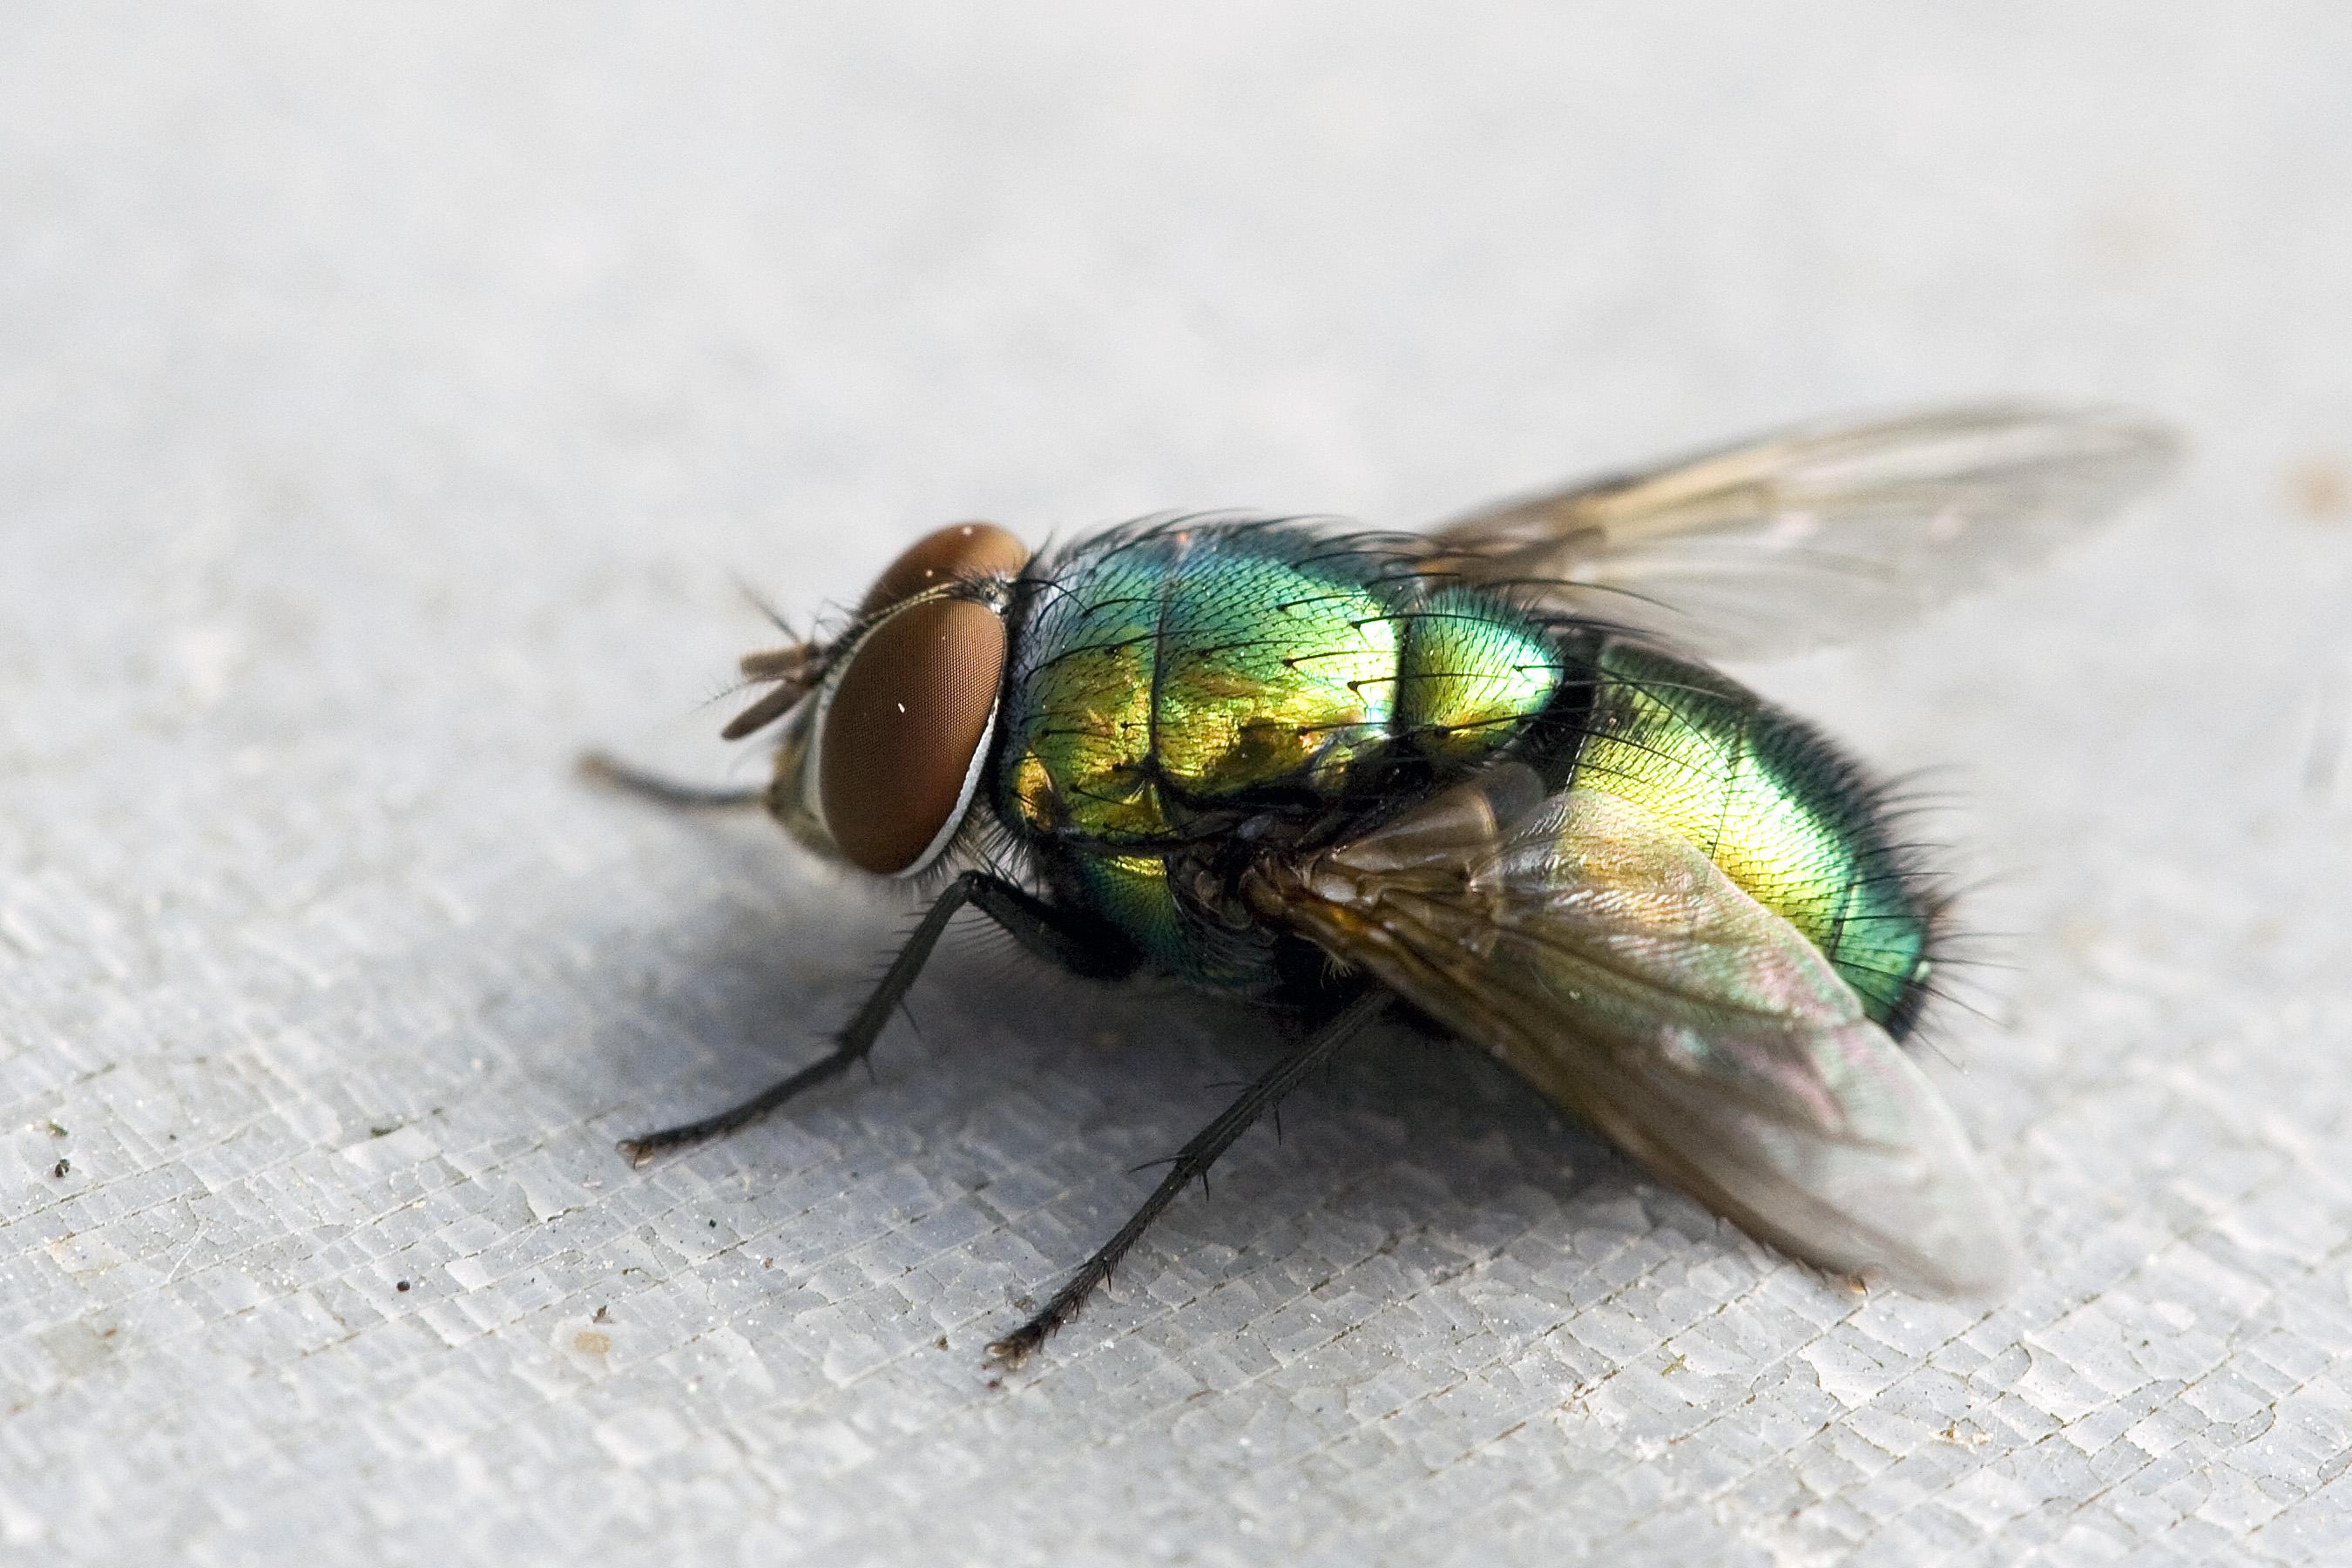 File:Green Fly.jpg - Wikimedia Commons